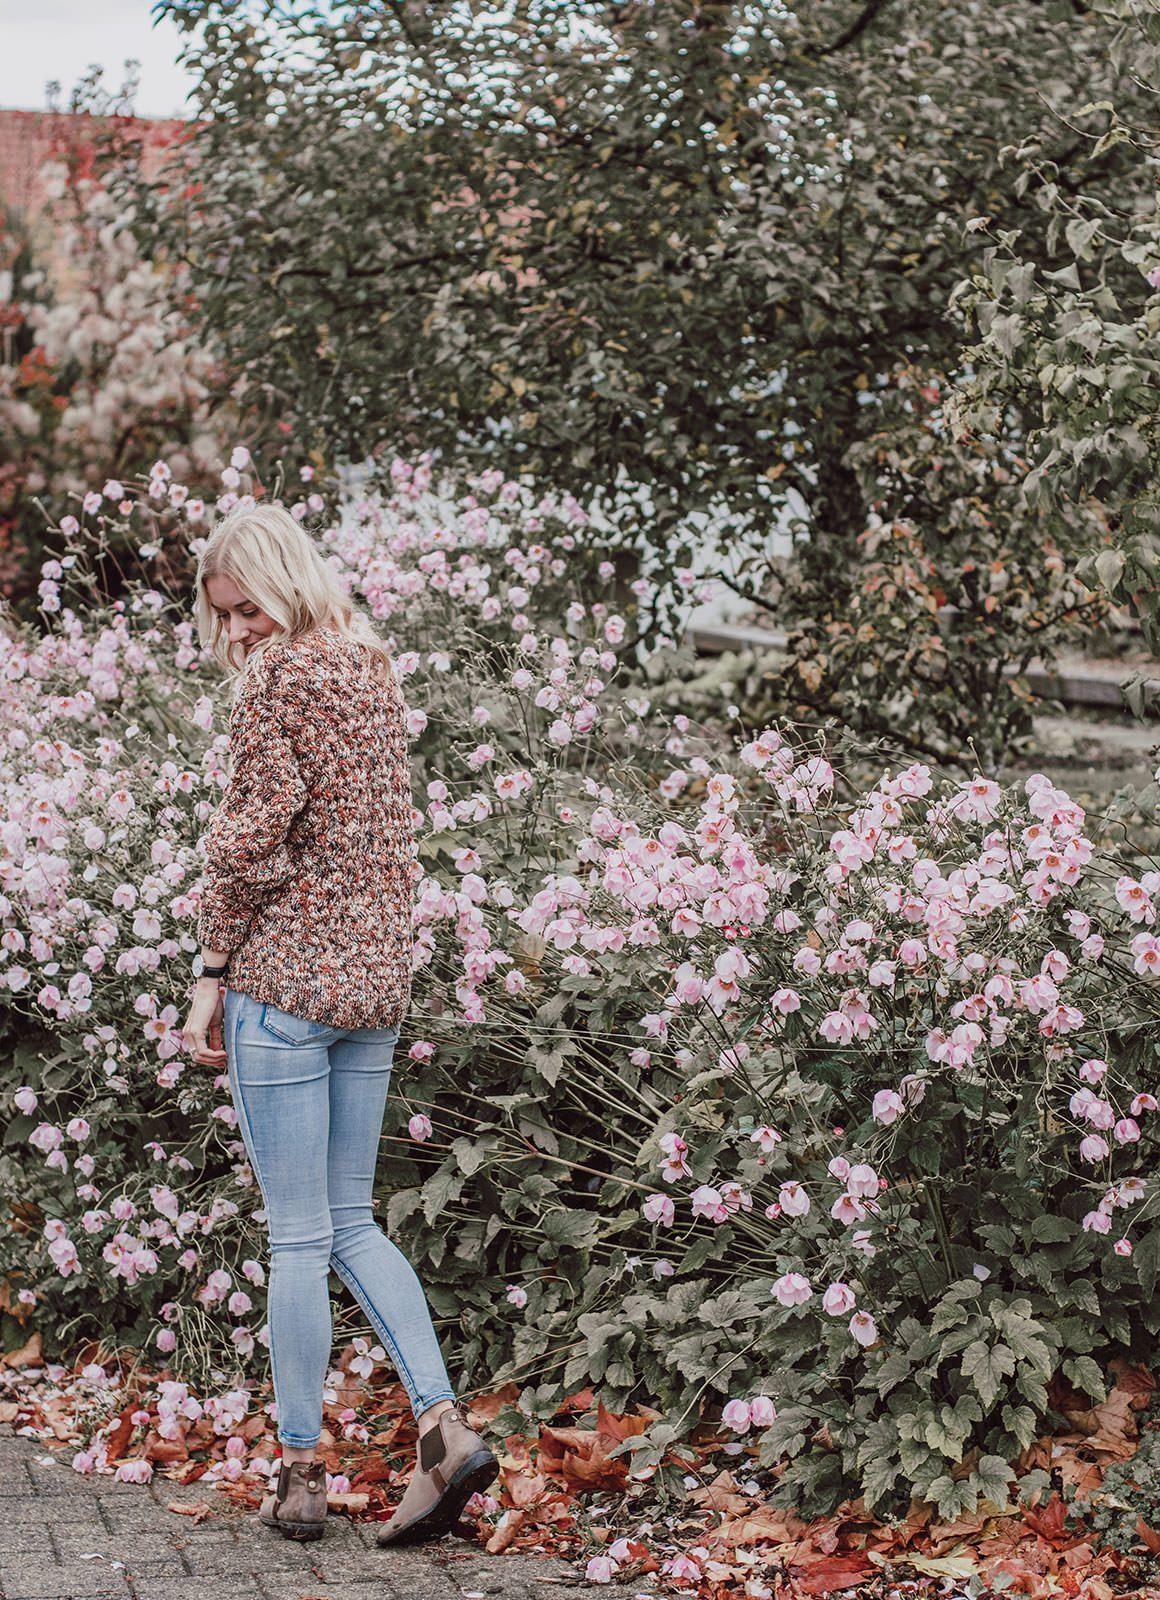 Autumn capsule wardrobe - multi sweater outfit